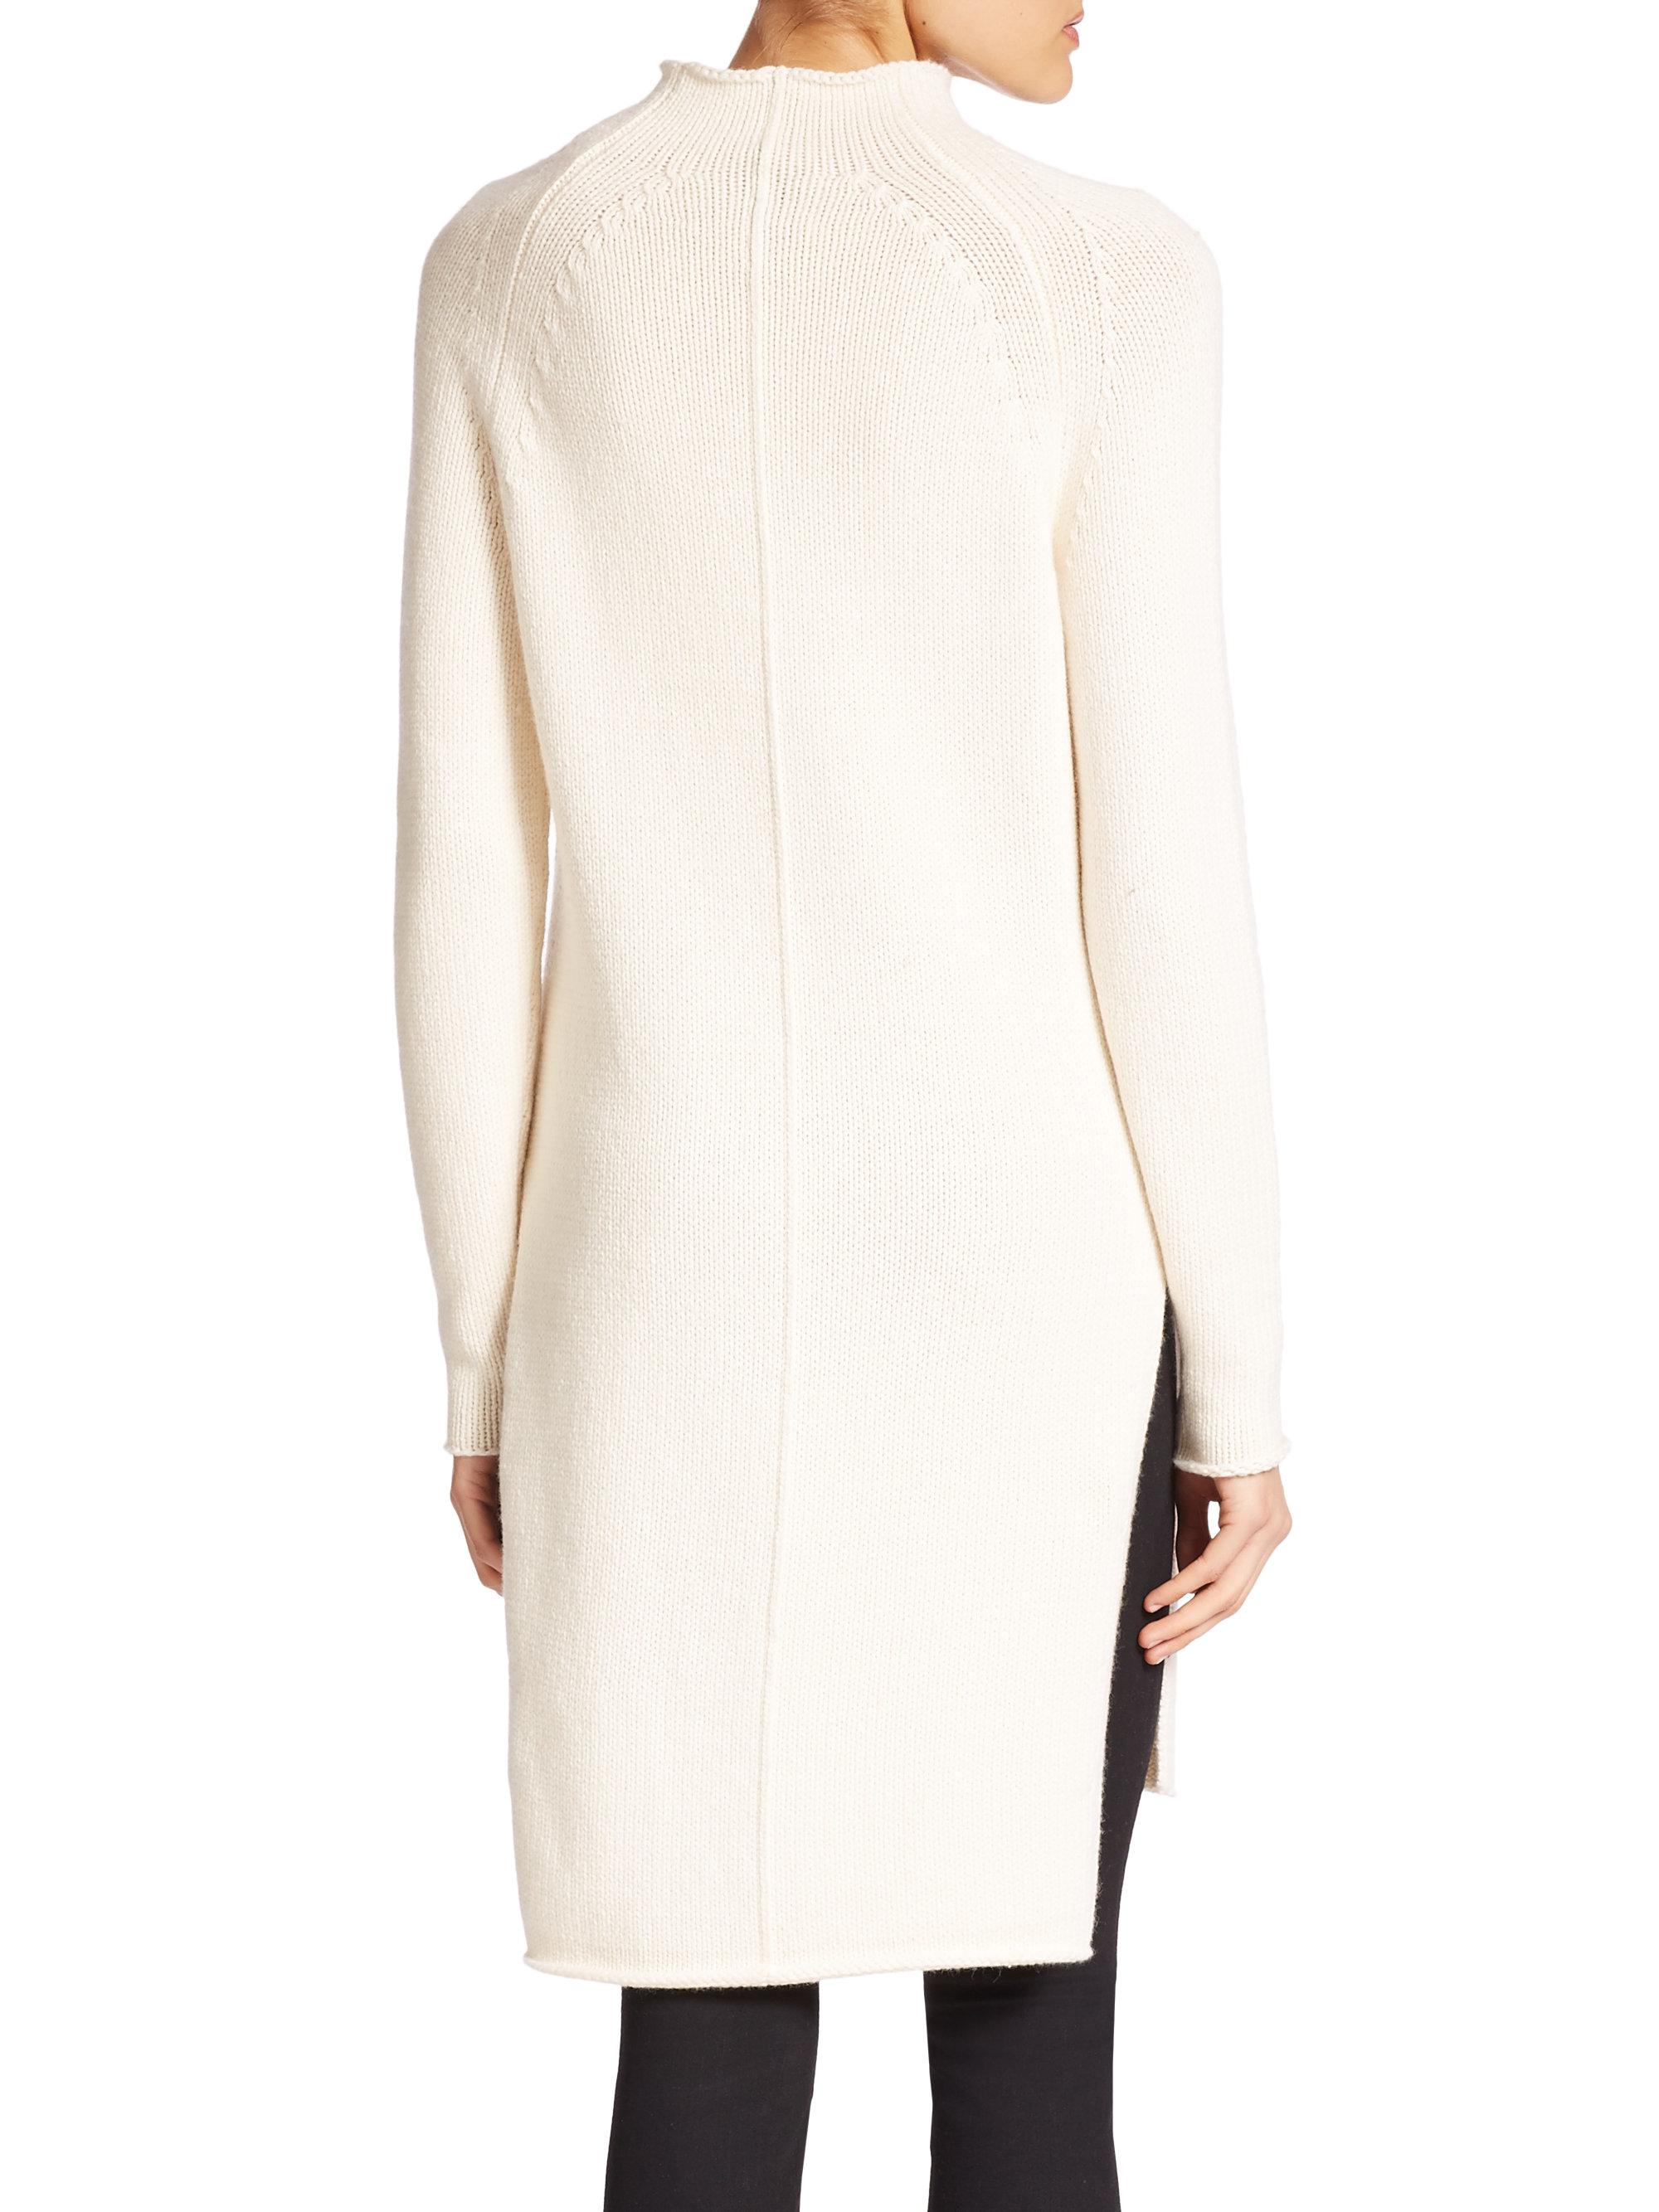 Winter White Tunic Sweaters 3